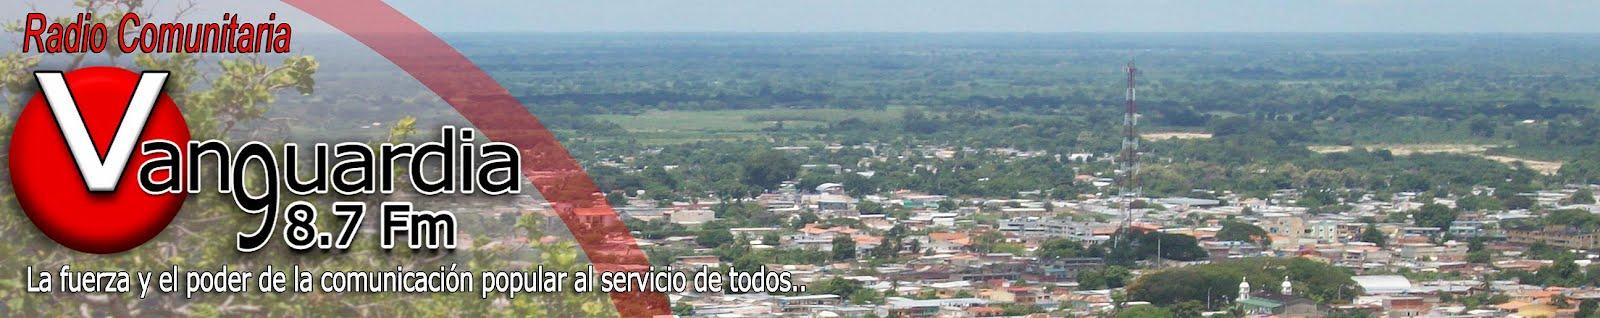 Radio Vanguardia 98.7 FM